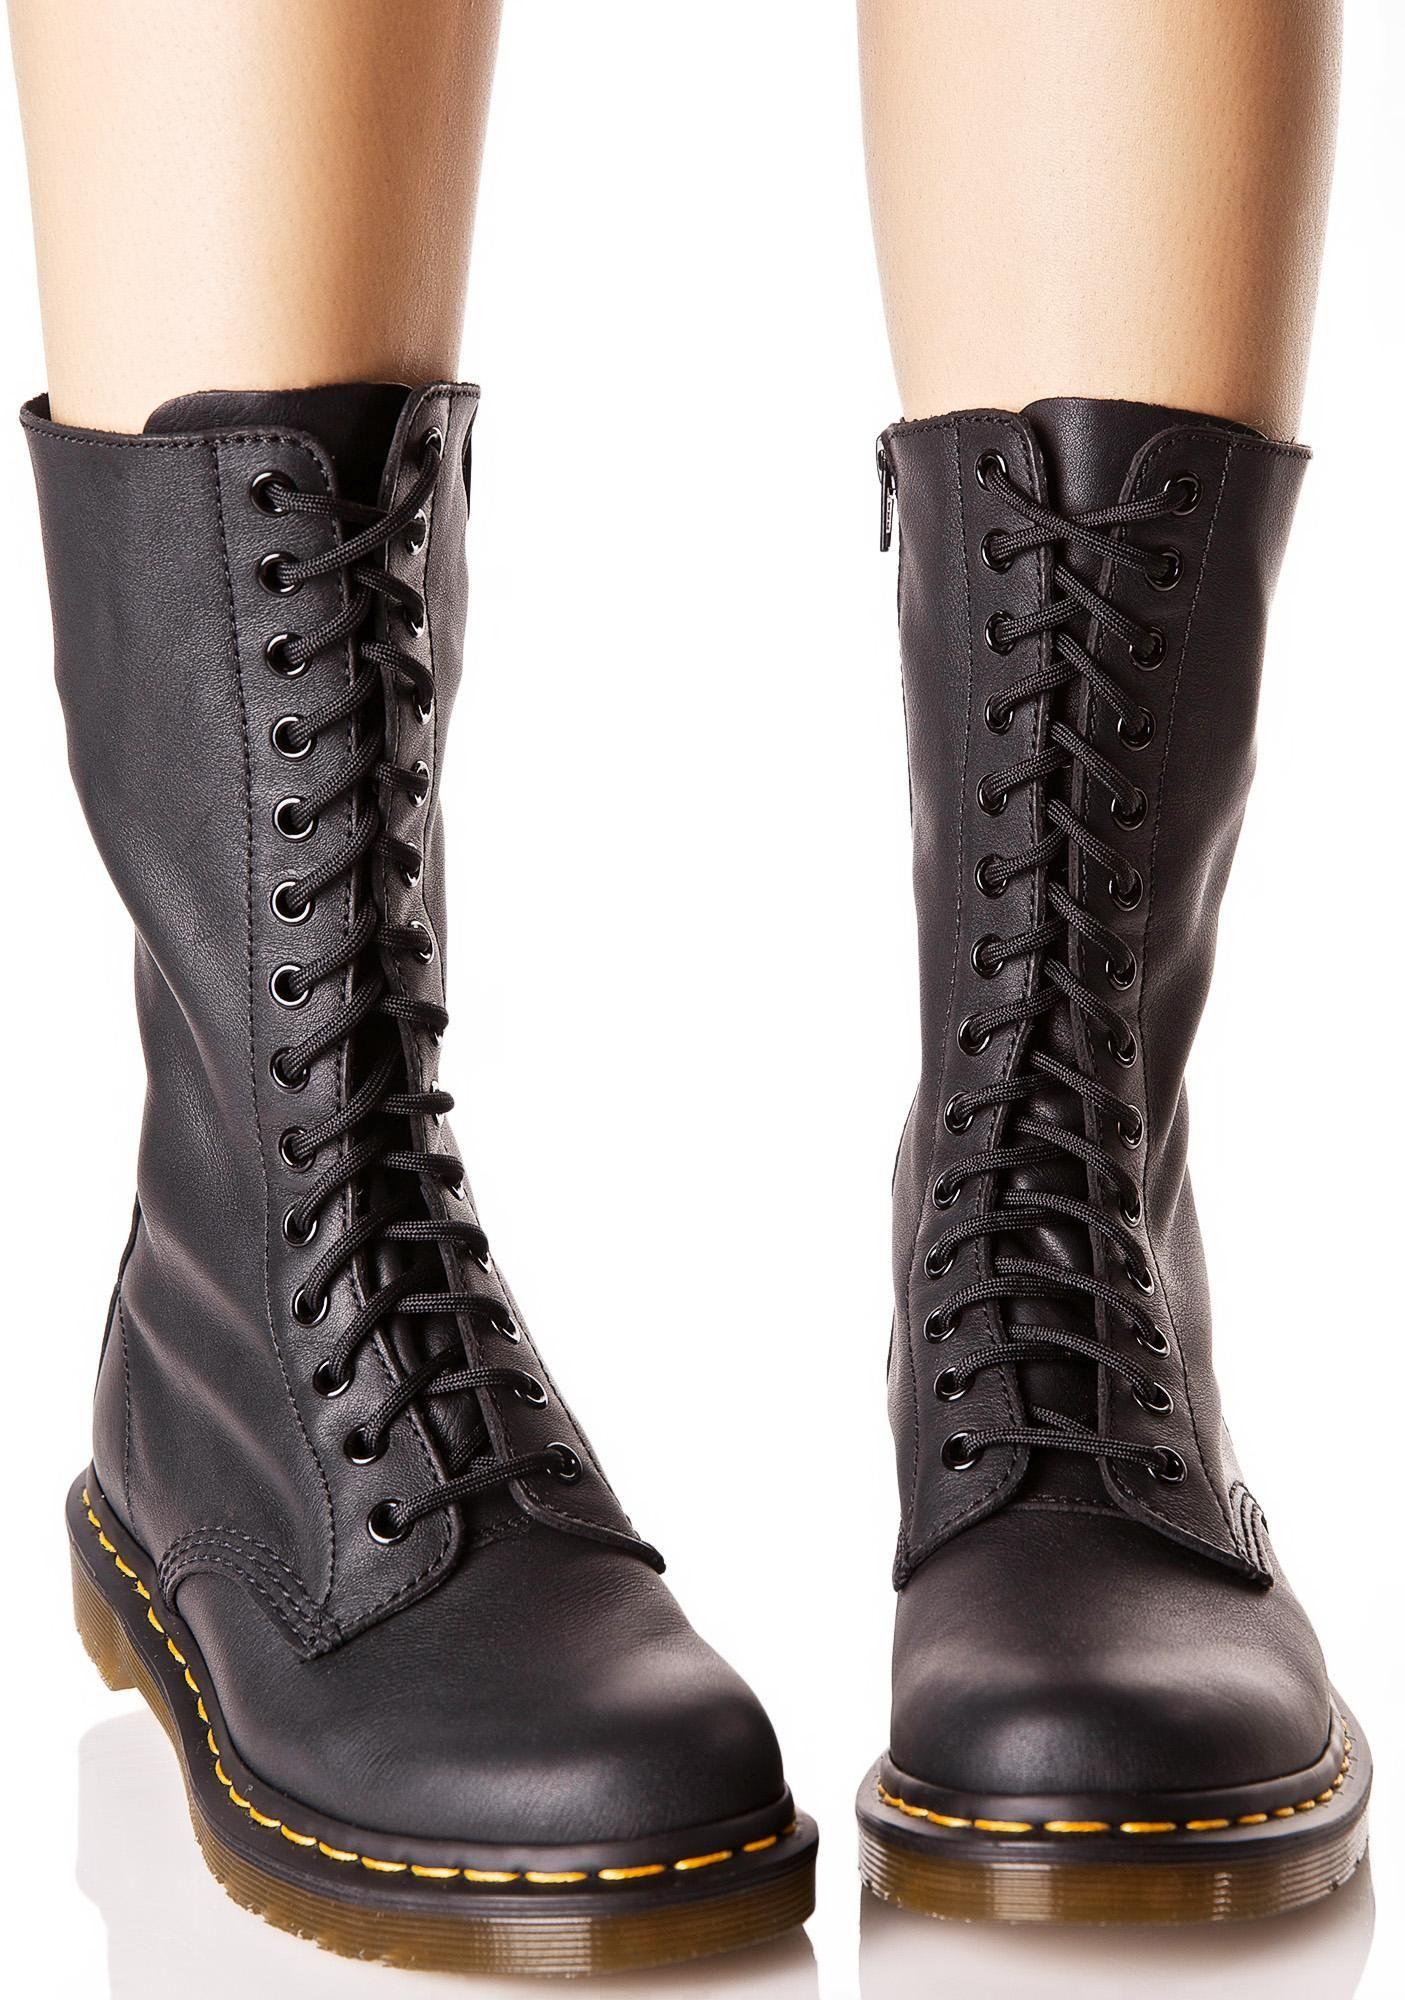 013c2f342a0c Dr. Martens 1B99 14 Eye Boots